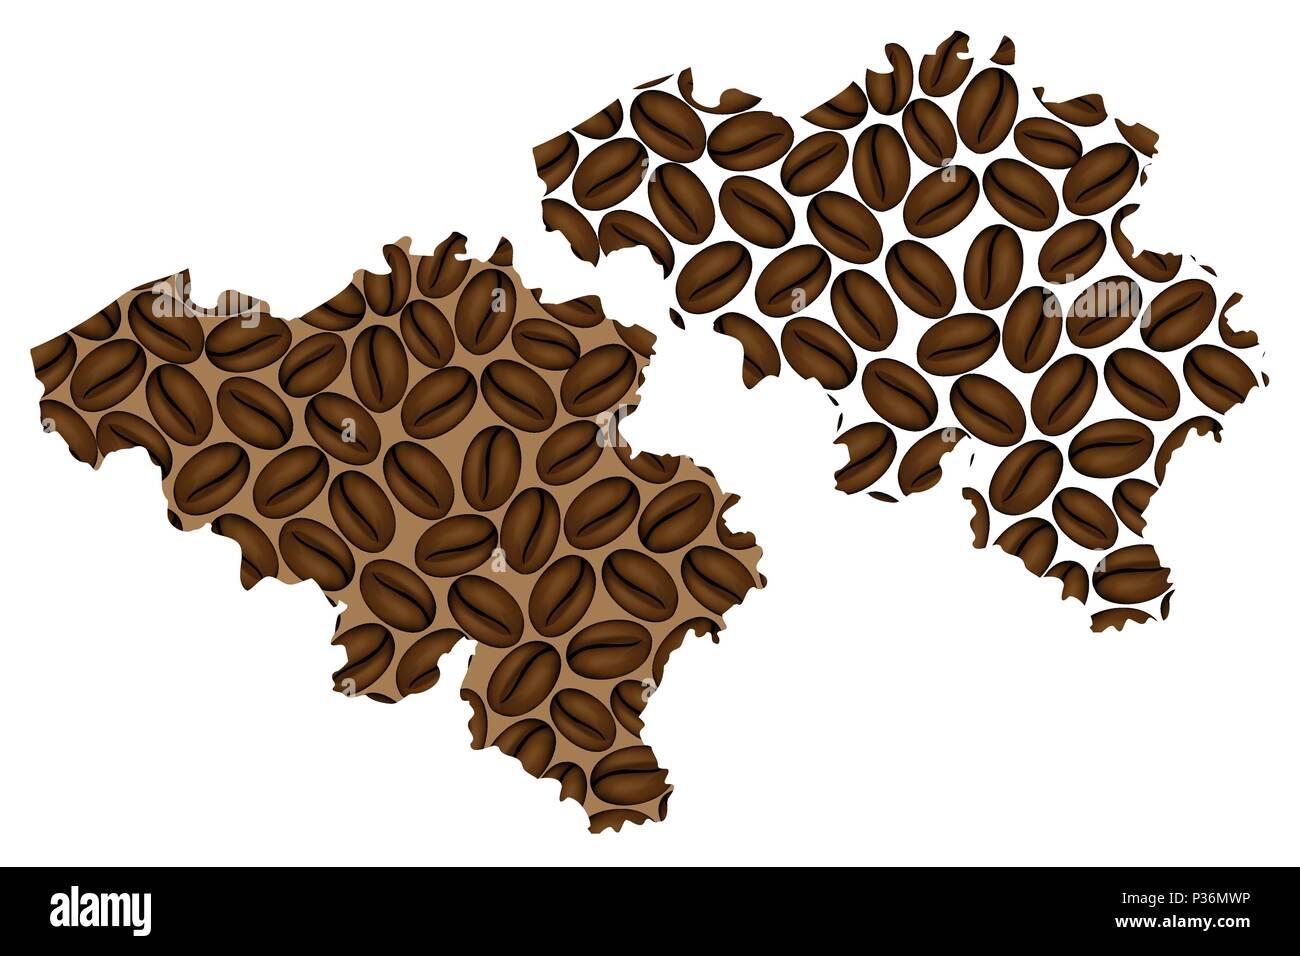 belgium map of coffee bean kingdom of belgium map made of coffee beans